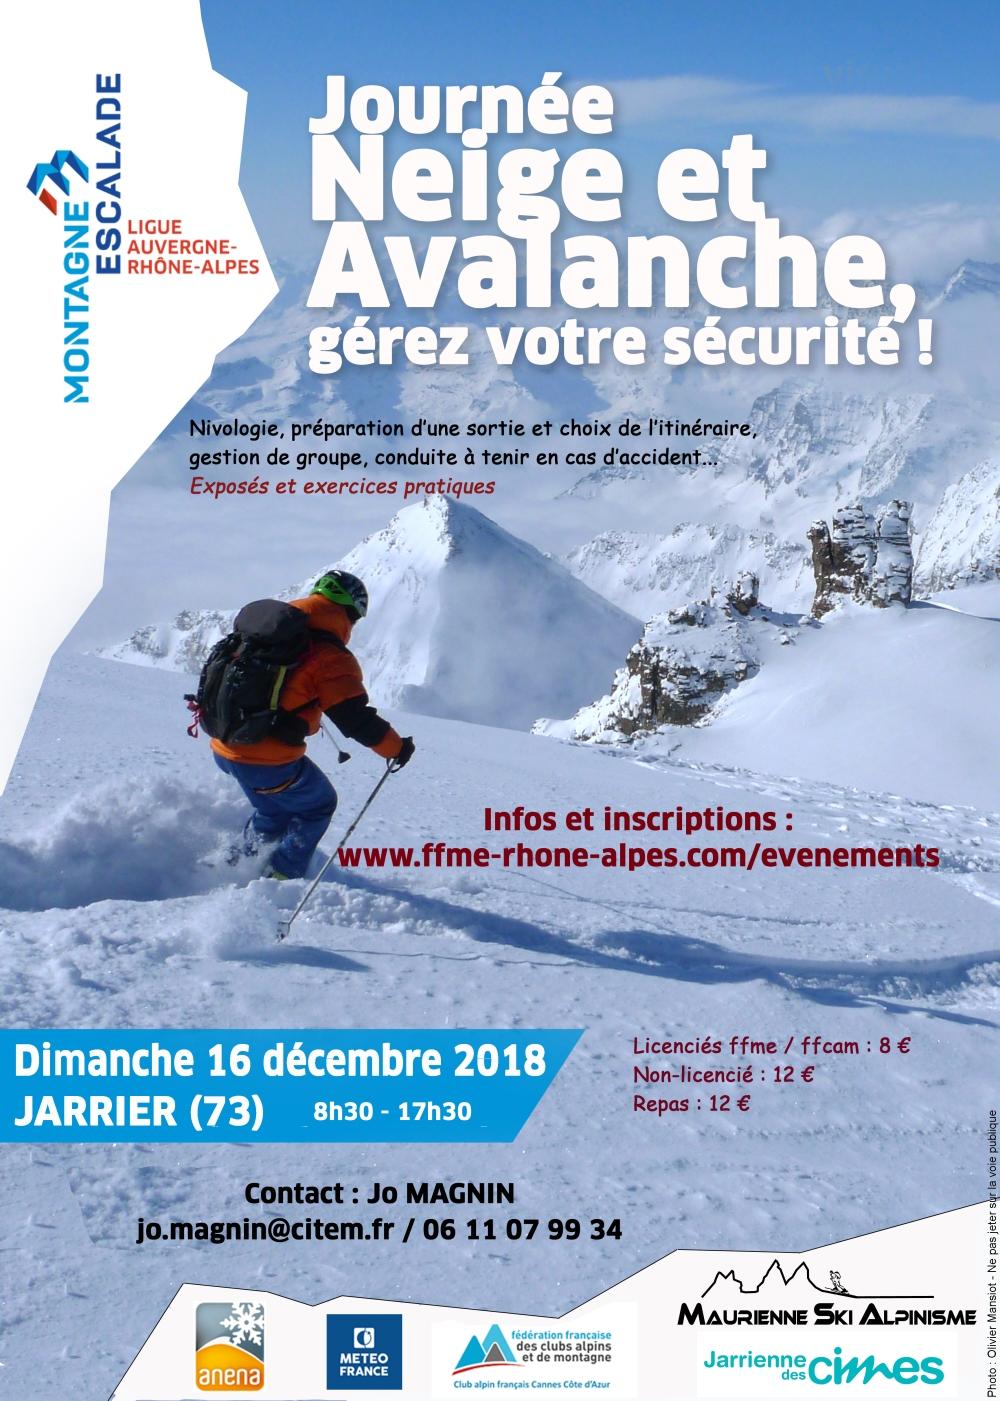 2018 neige avalanche JARRIER